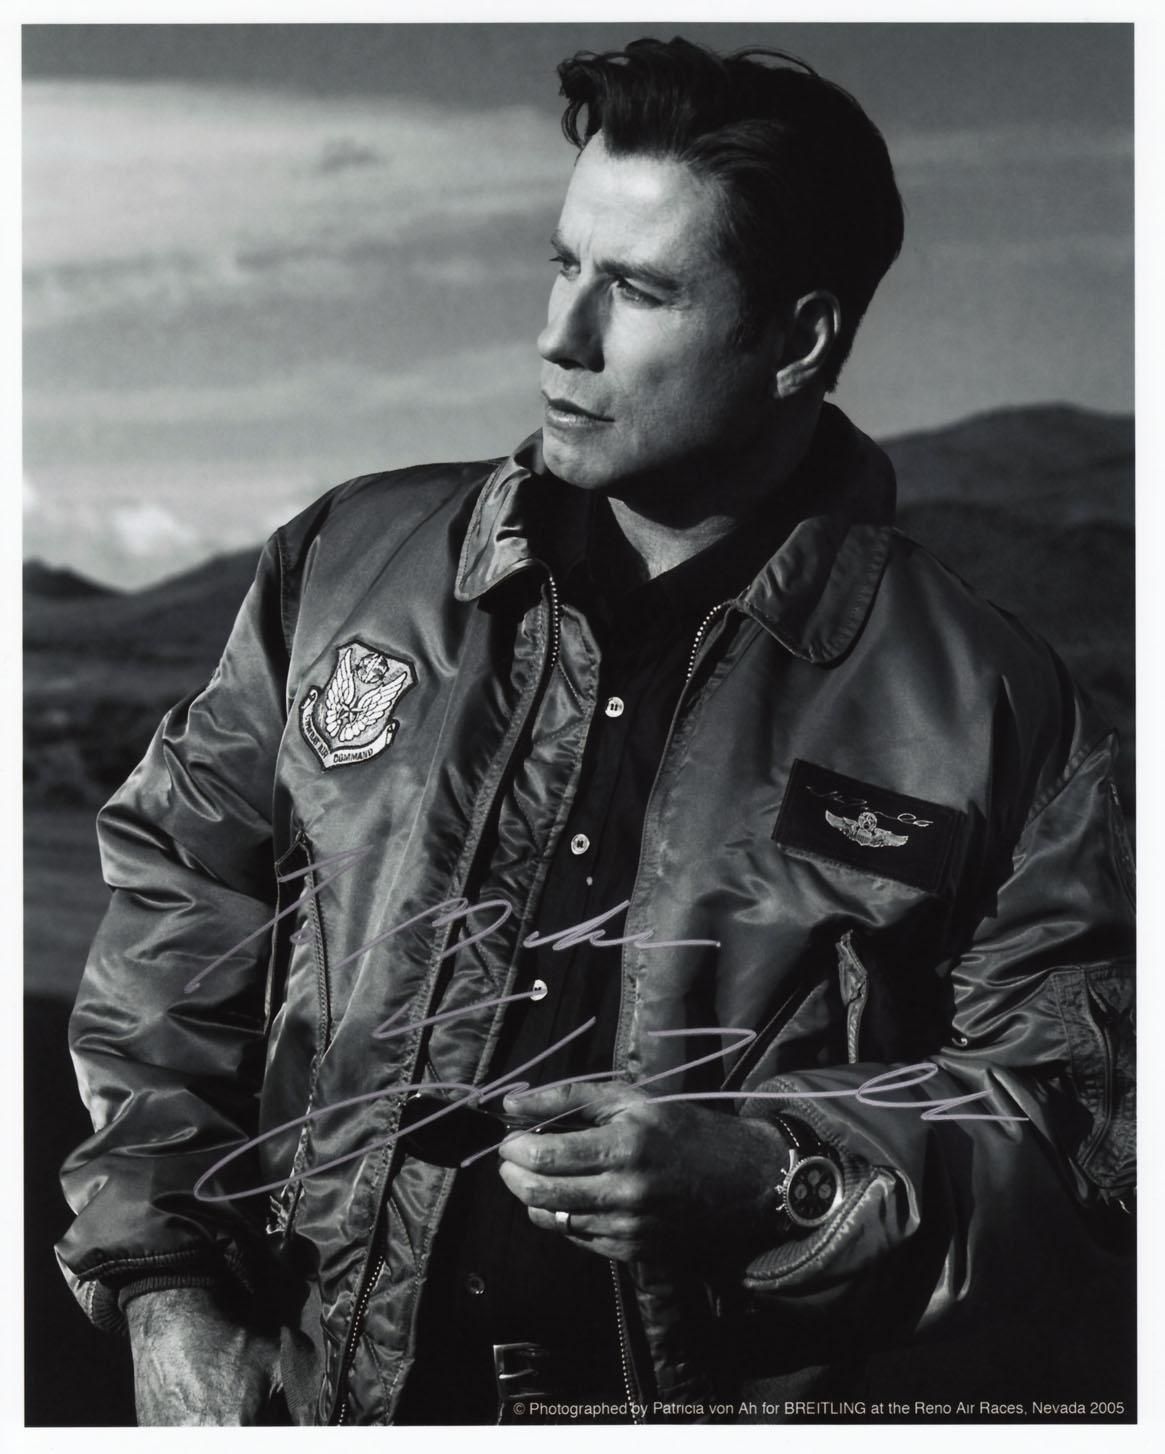 http://1.bp.blogspot.com/_LVklrIcARbI/TRQEvrqp8HI/AAAAAAAAAKg/yoR7o2On_mk/s1600/John+Travolta.jpg